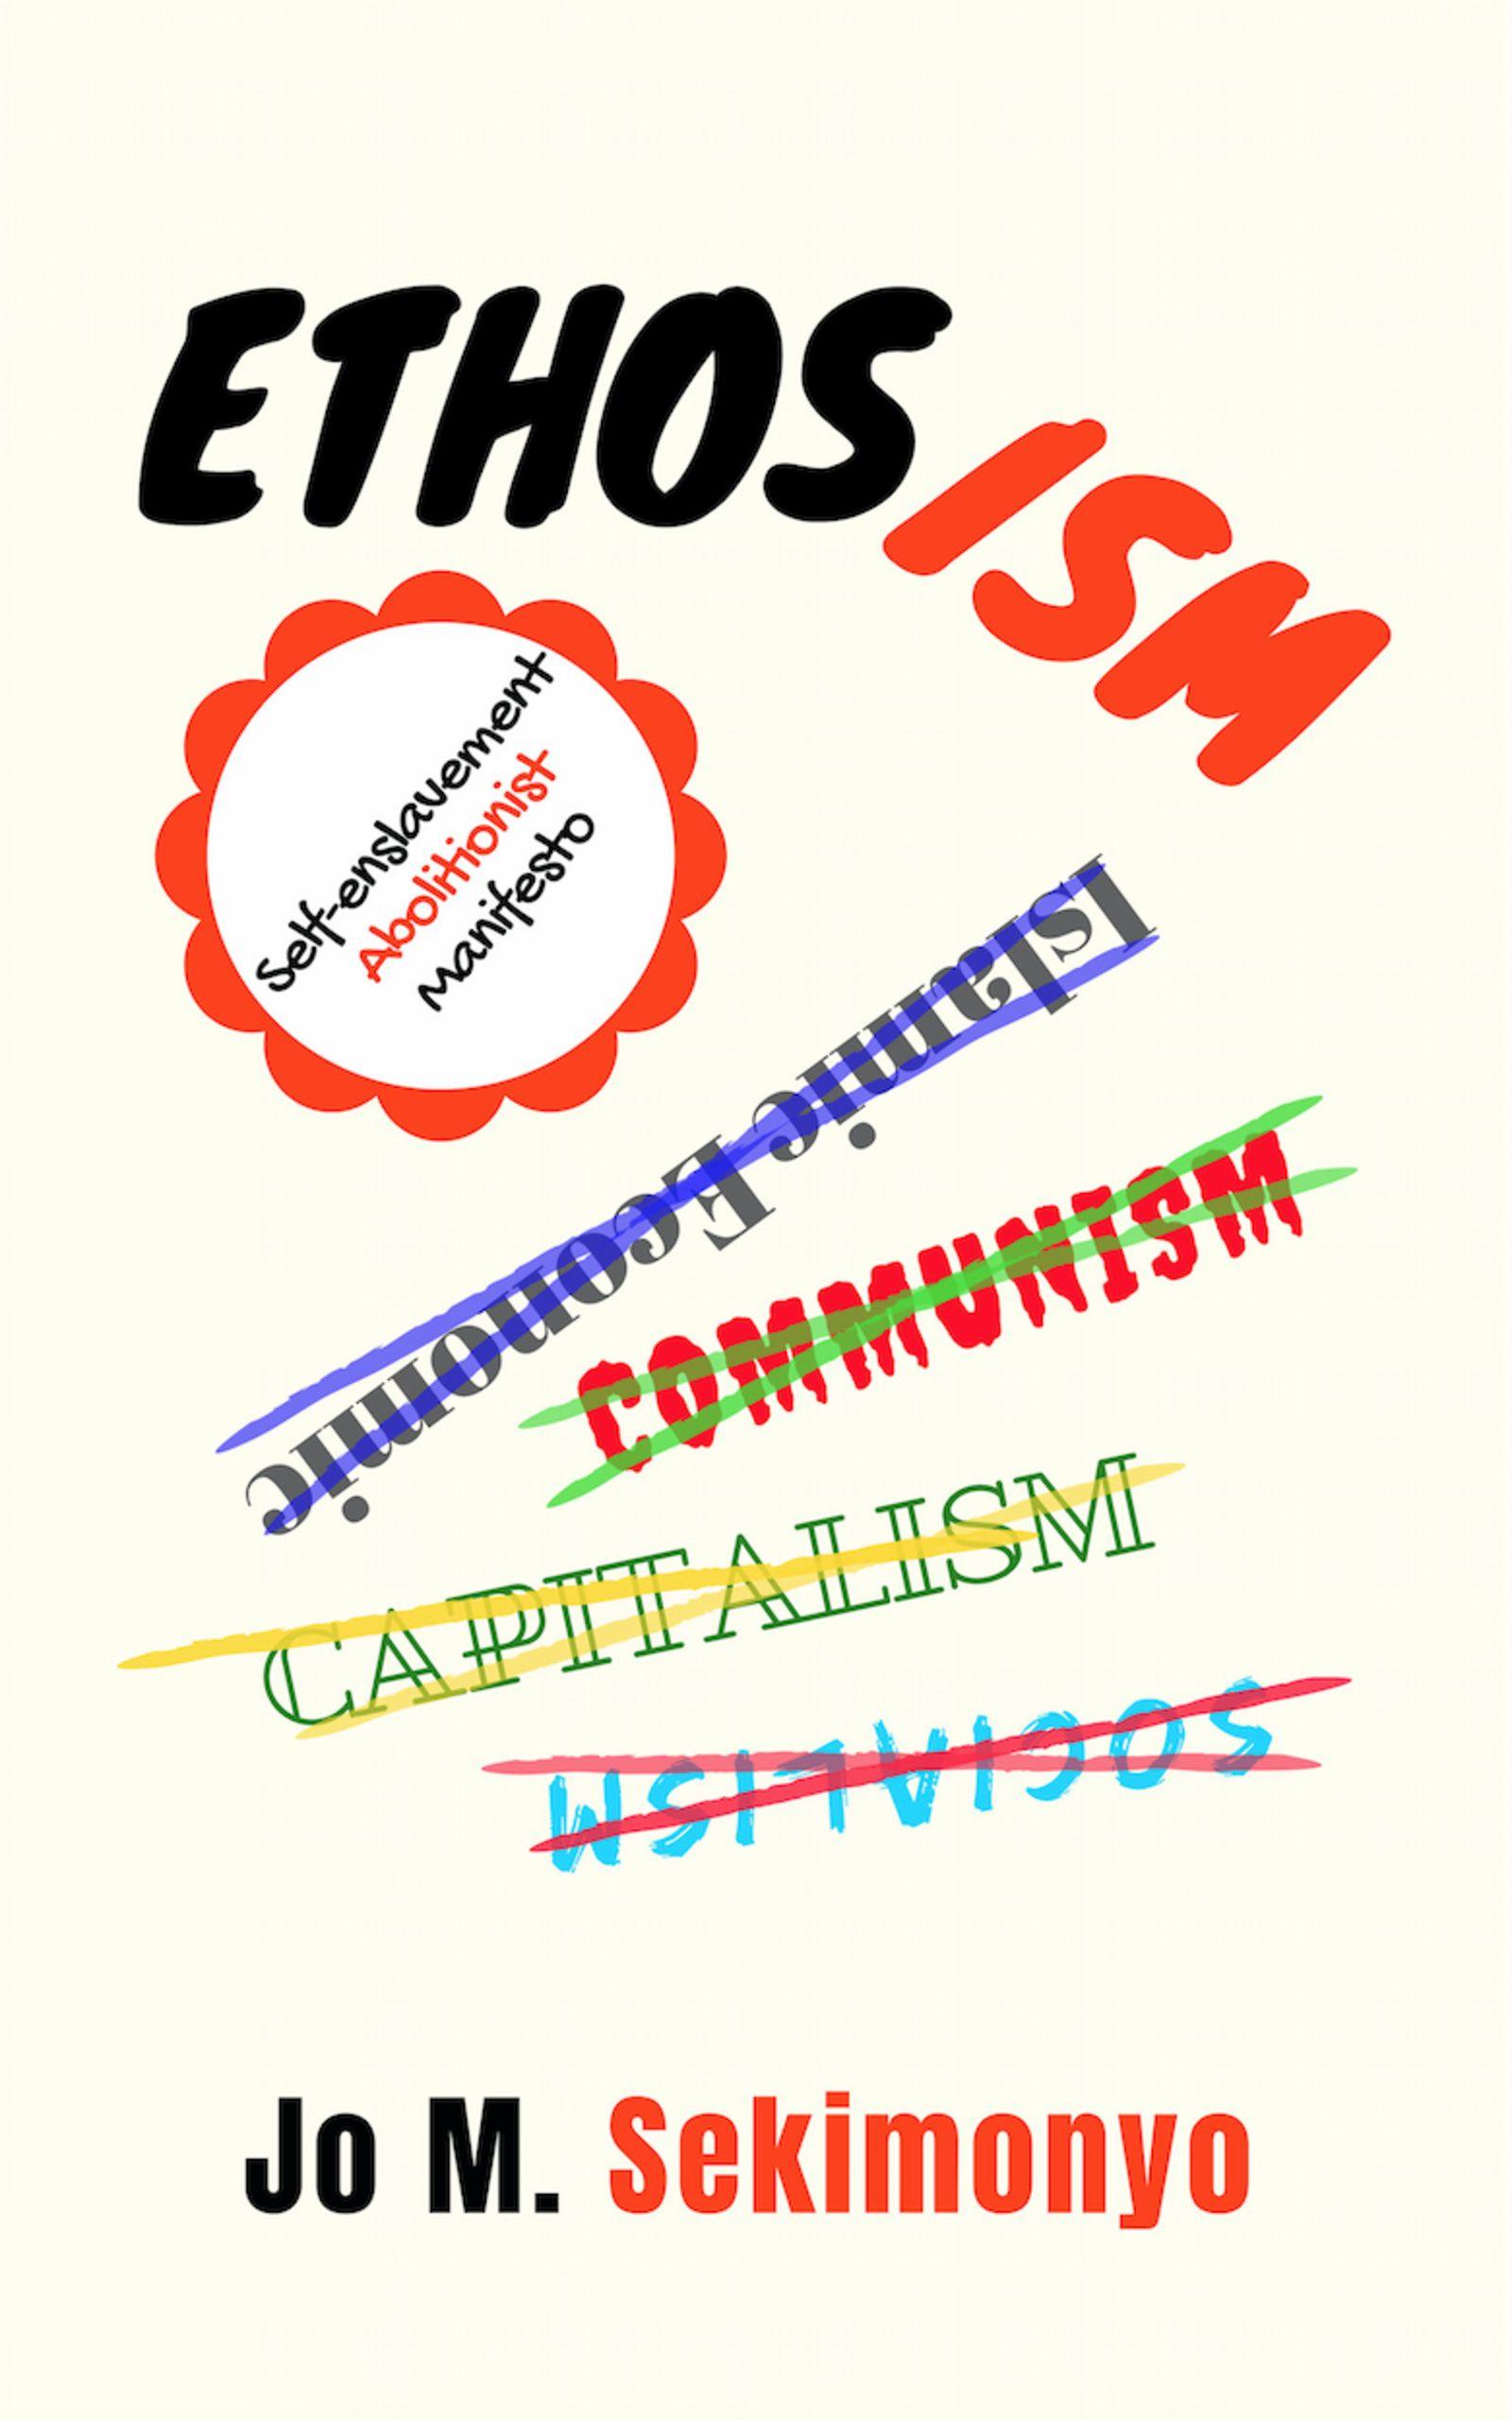 Ethosism in 2020 author paradigm shift capitalism